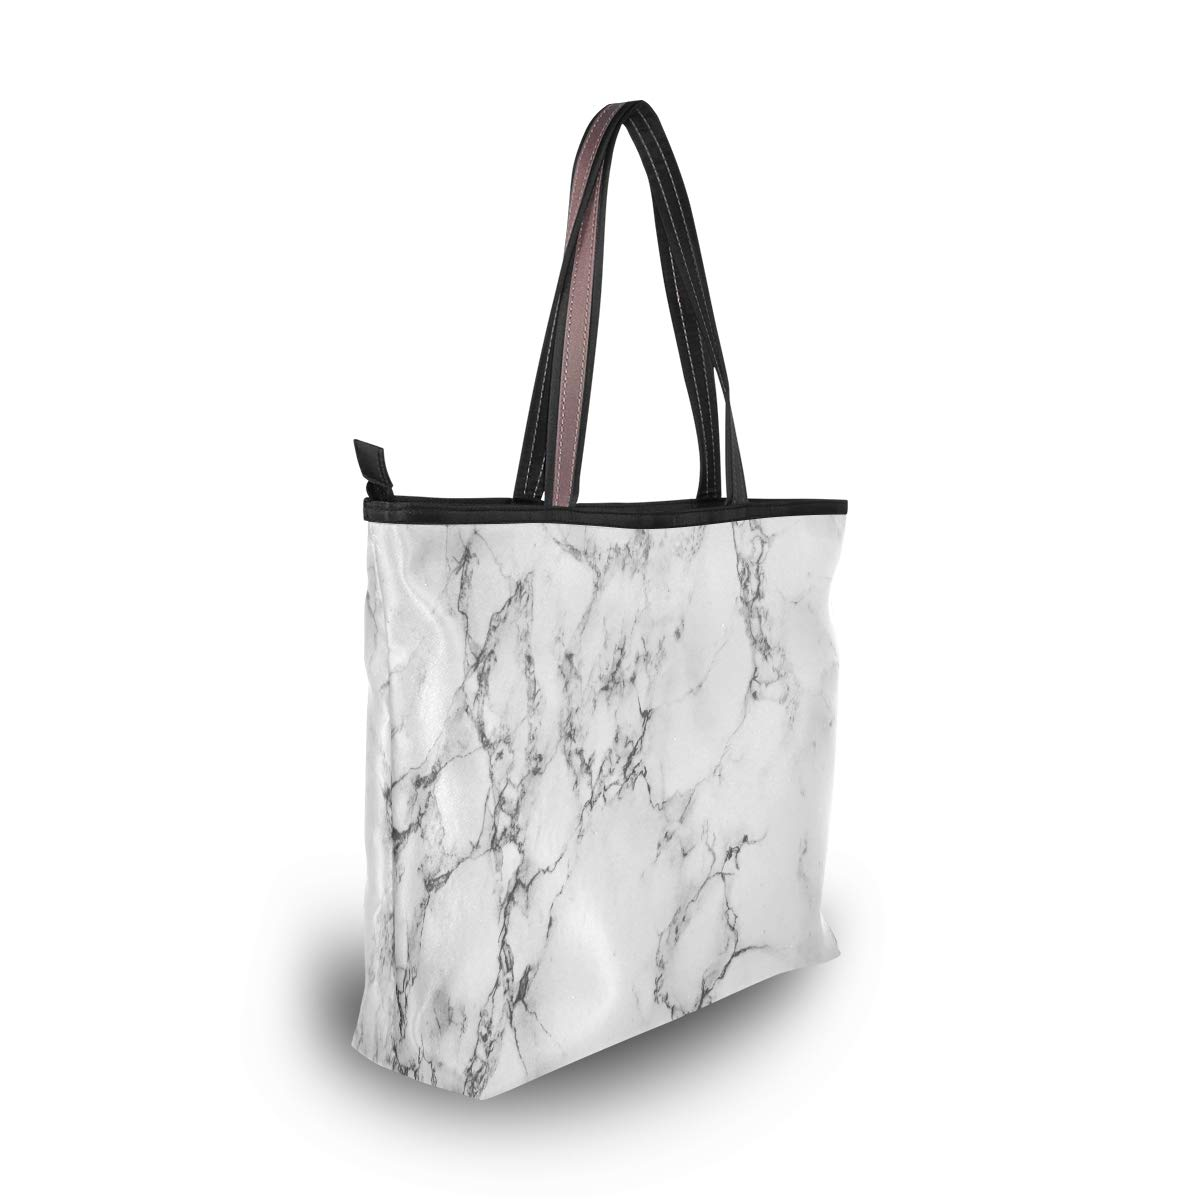 HousingMart Large Women Tote Bag US Flag Print Handbags Tote Handle with Zipper Shoulder Bag Grocery Shopping Work Bag